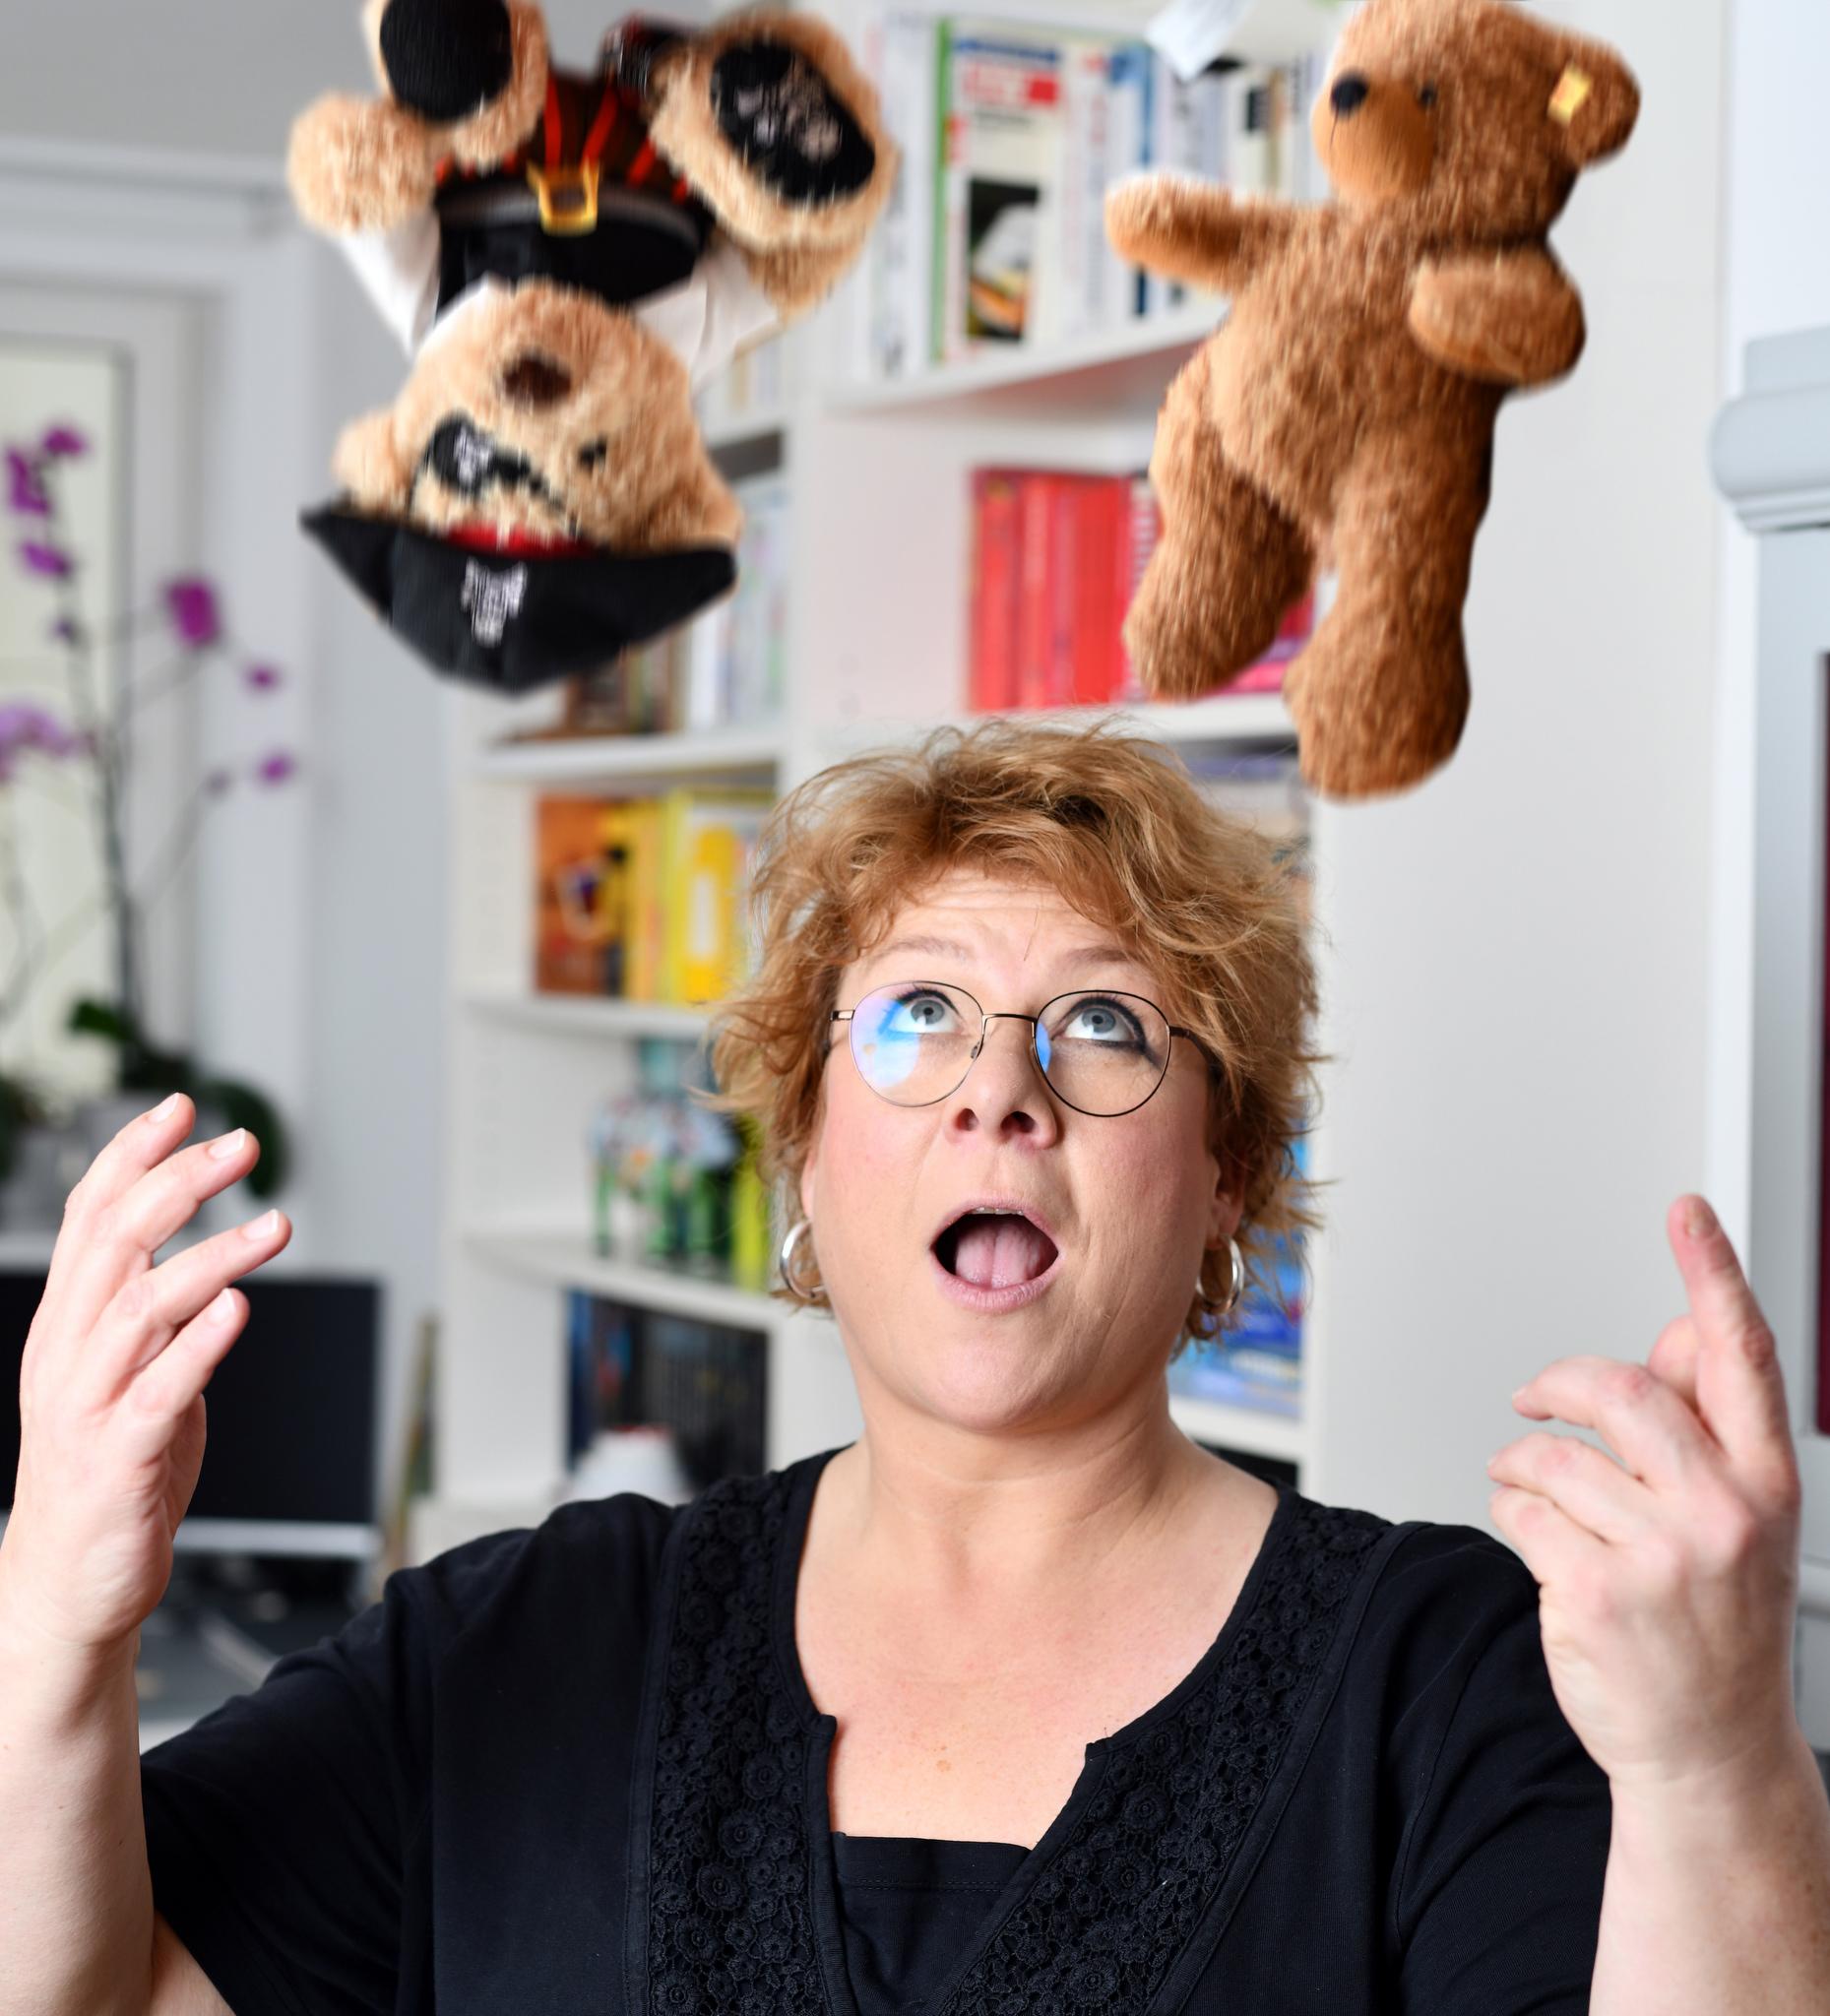 Anke Brinkmann Muttglück Muttispielt Mama Mamablog Mamablogger München Familie Familienblog Mamablogger Eltern Mutterglück Kiel MutterKutter